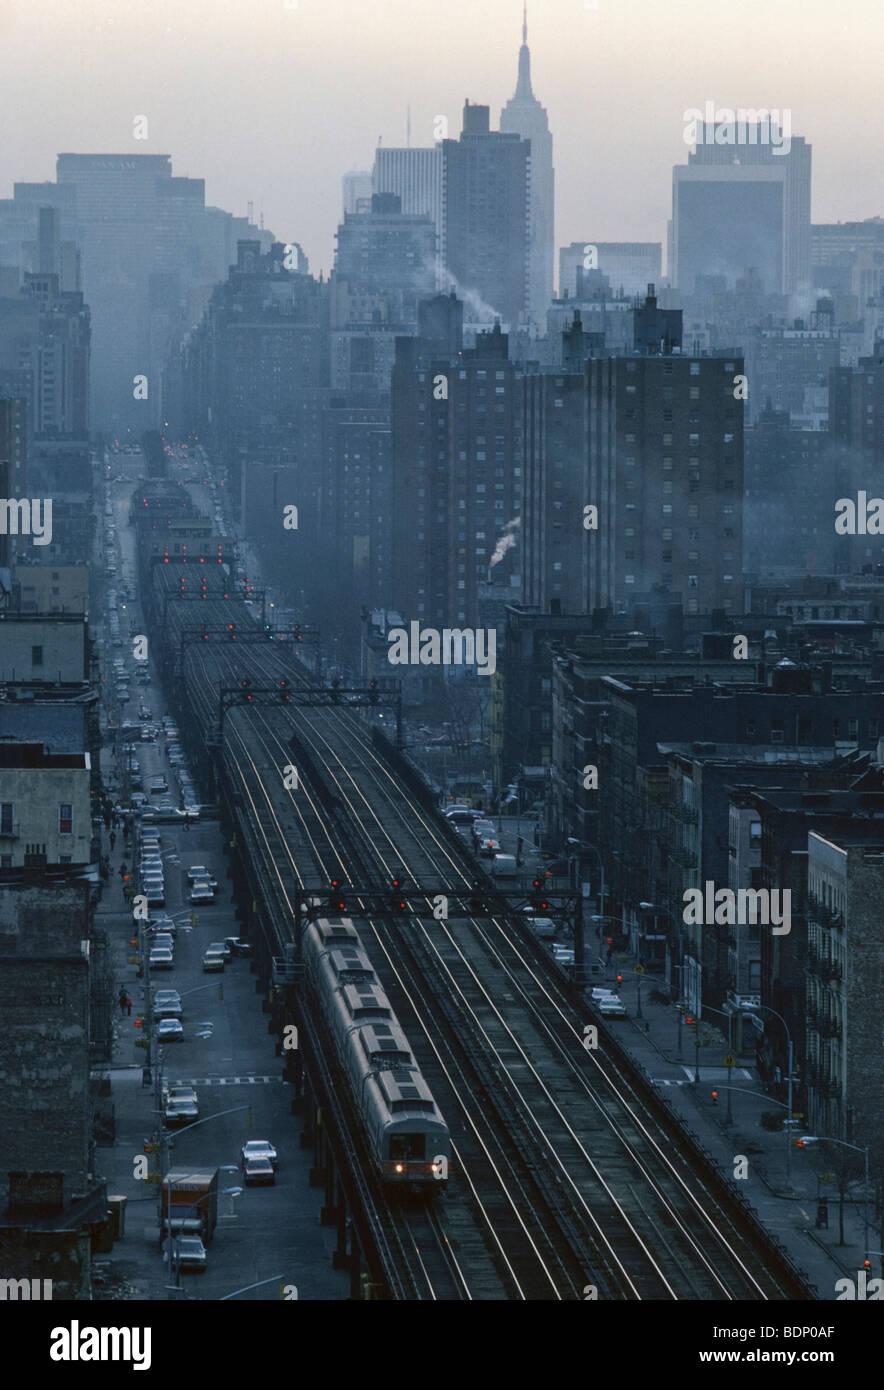 Harlem subway station, 125th Street station looking south, New York - Stock Image